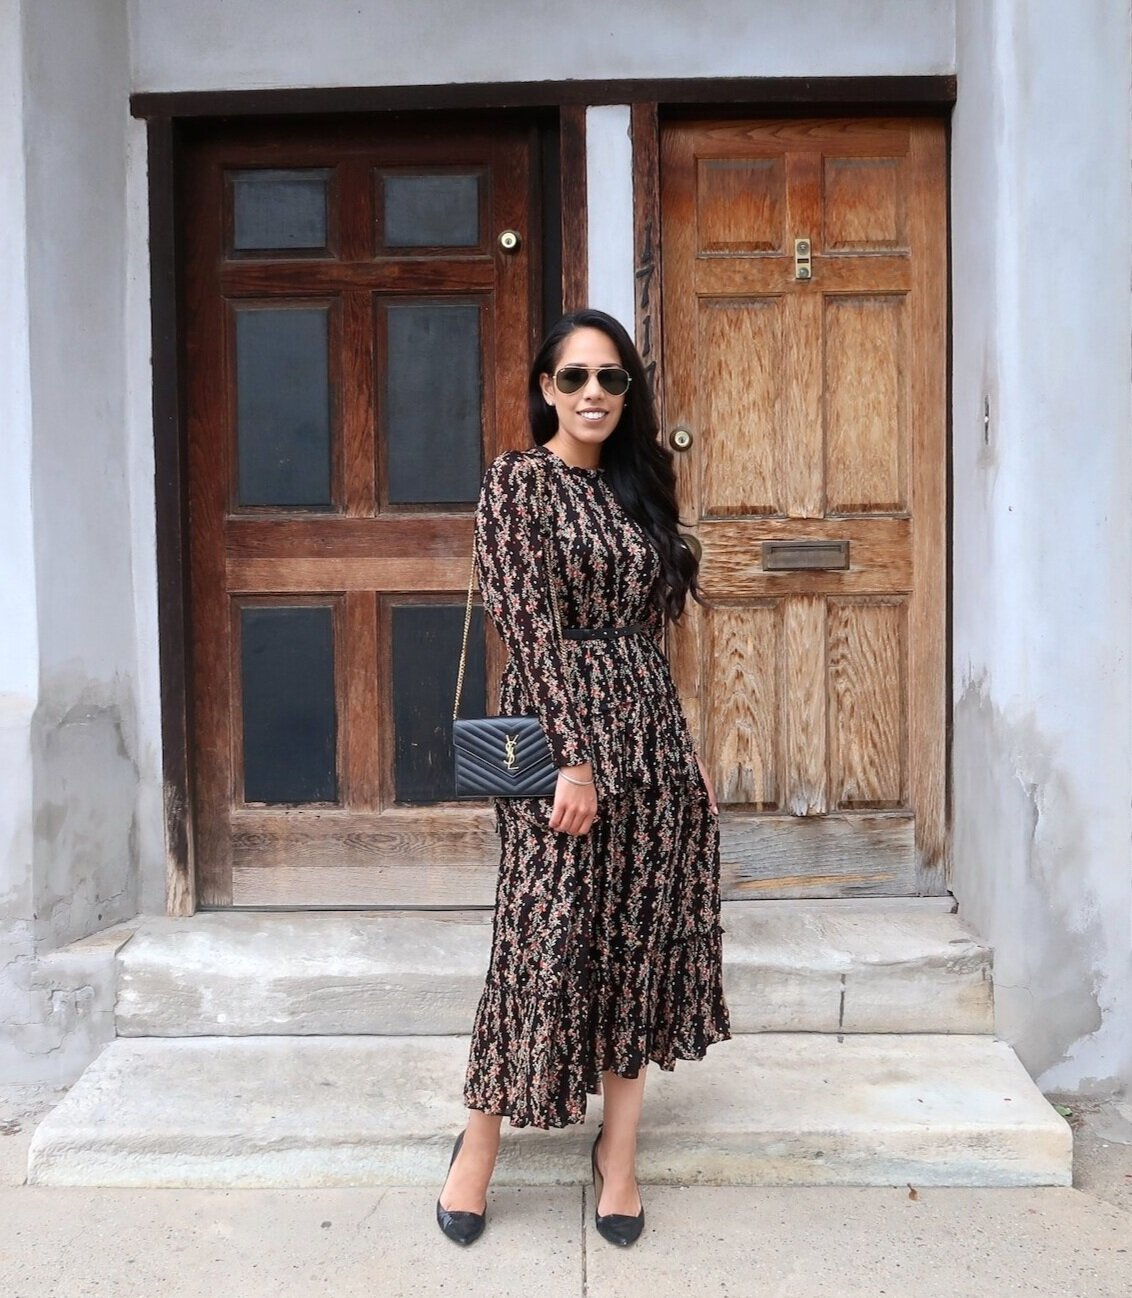 10-Favorite-Dresses-Wear-This-Fall.JPG